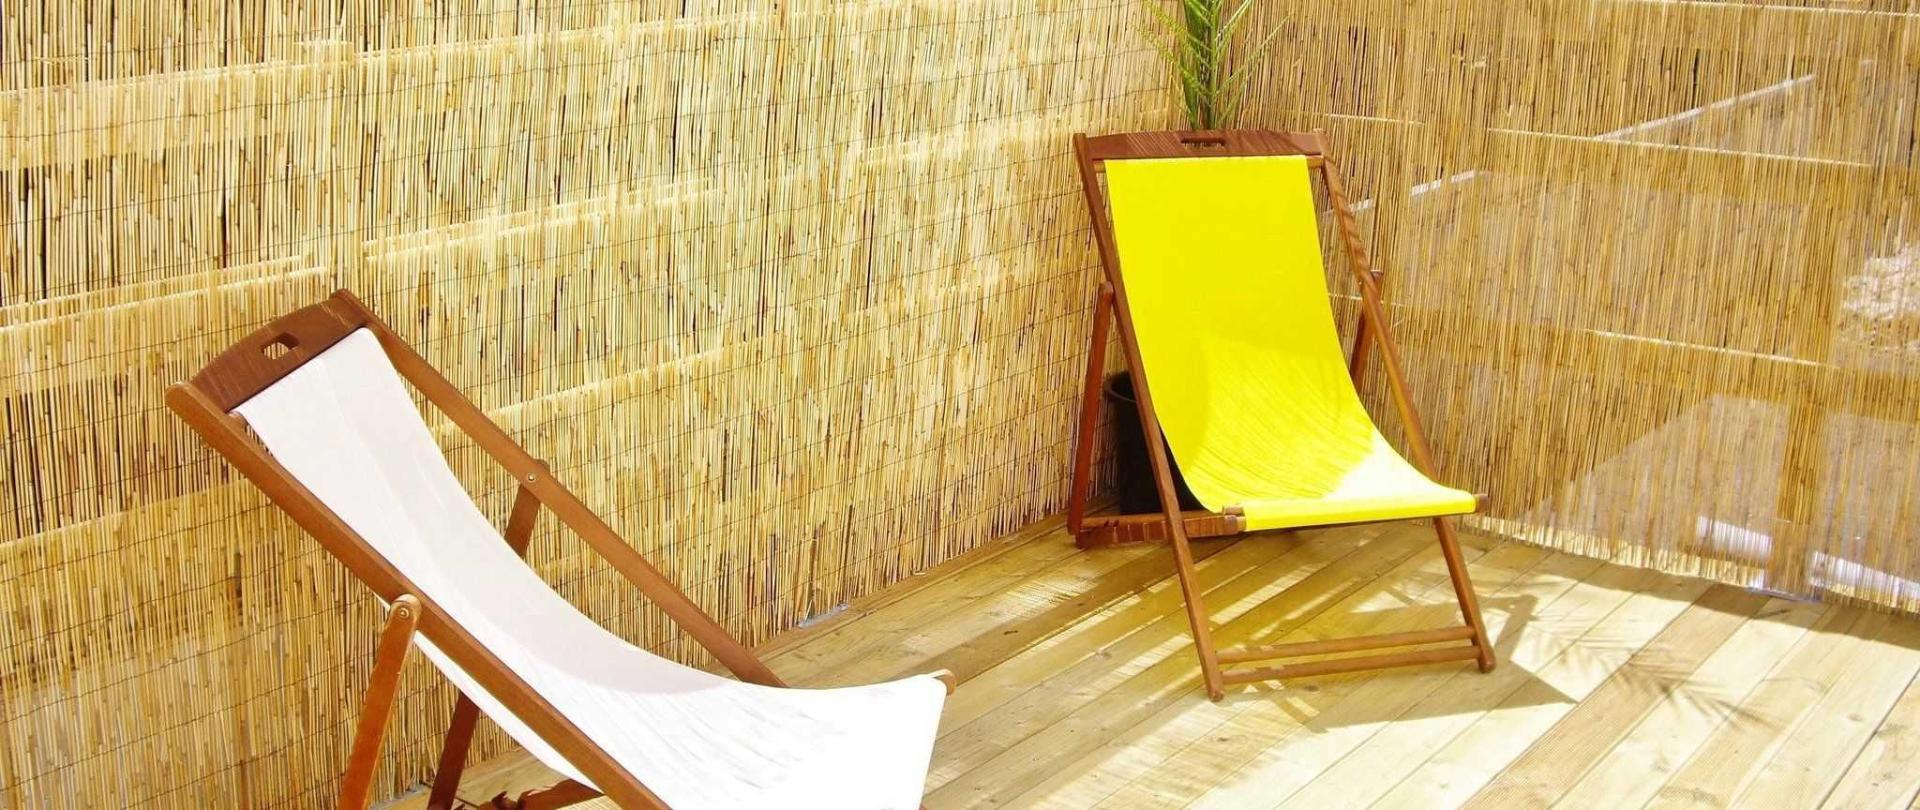 Appartement Vacances Mer.JPG